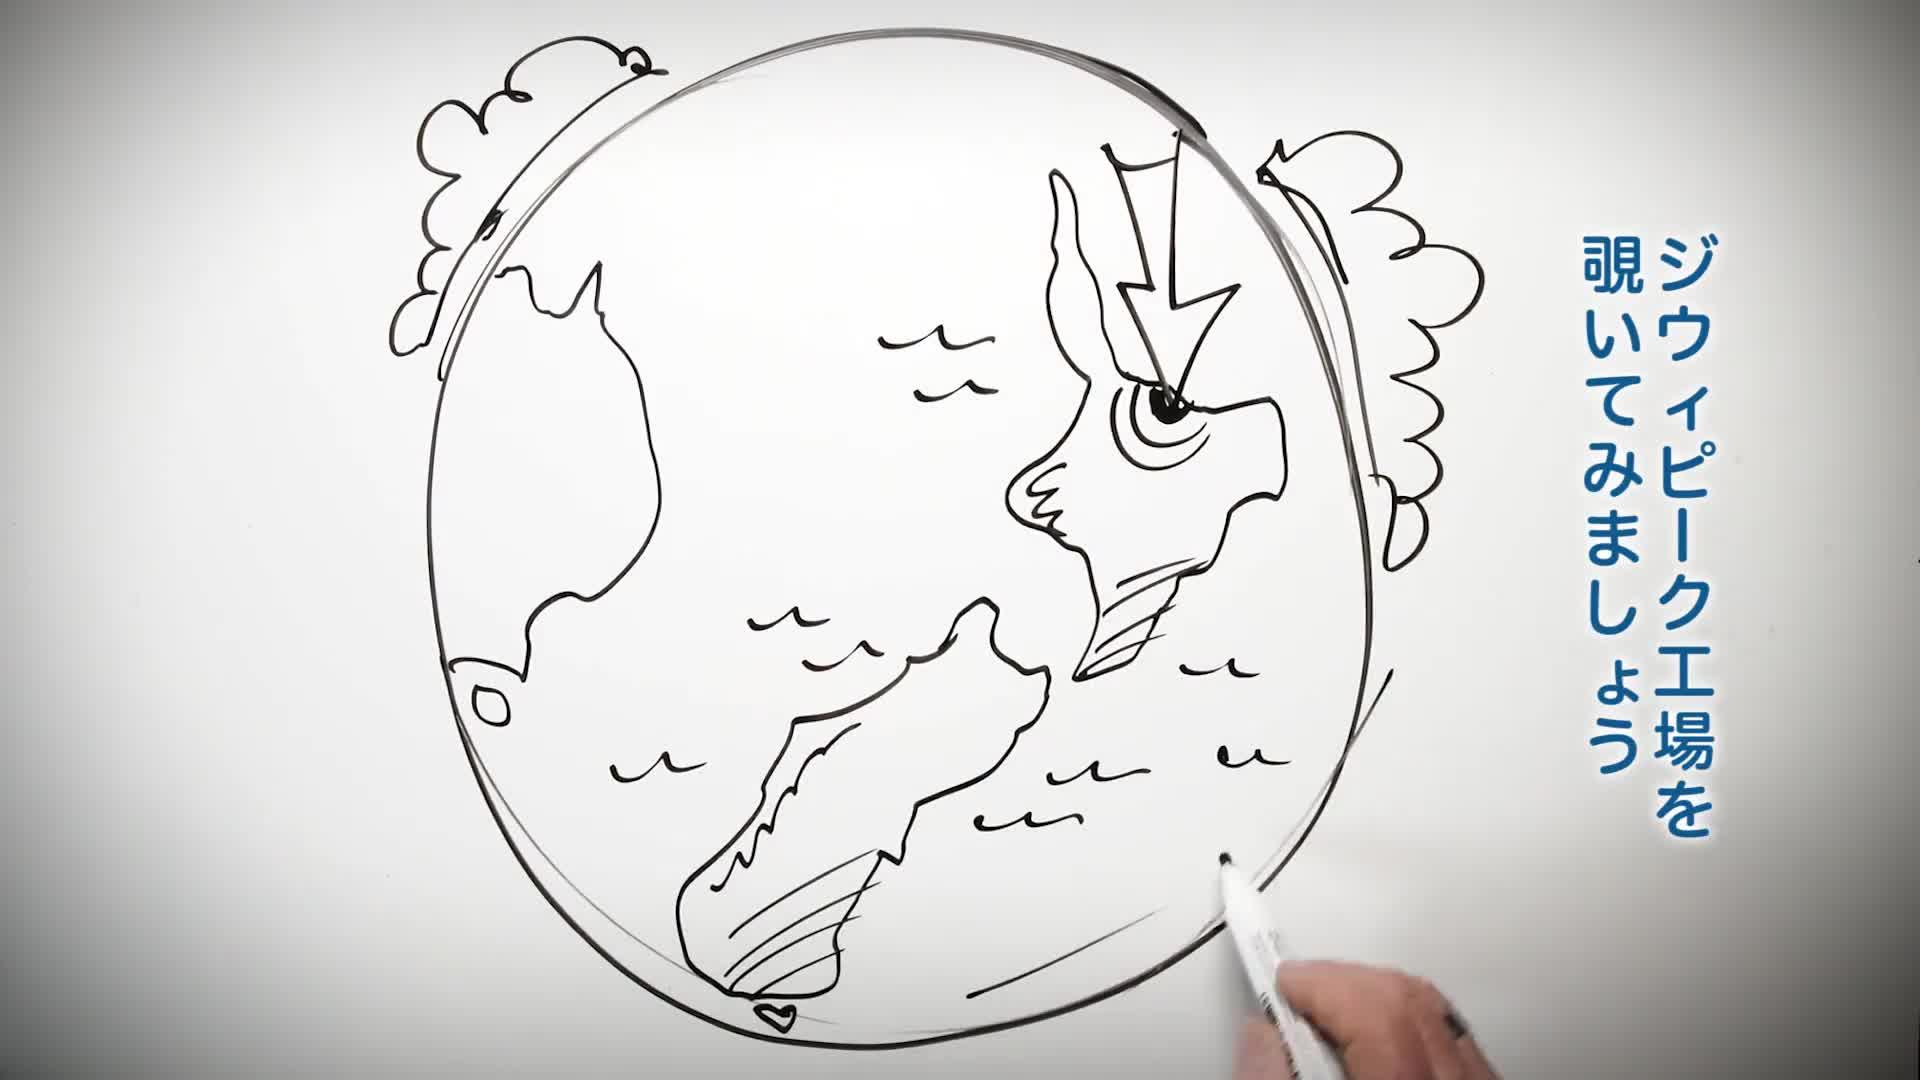 ZiwiPeak エアドライ・キャットフード フリーレンジチキン サンプル動画2